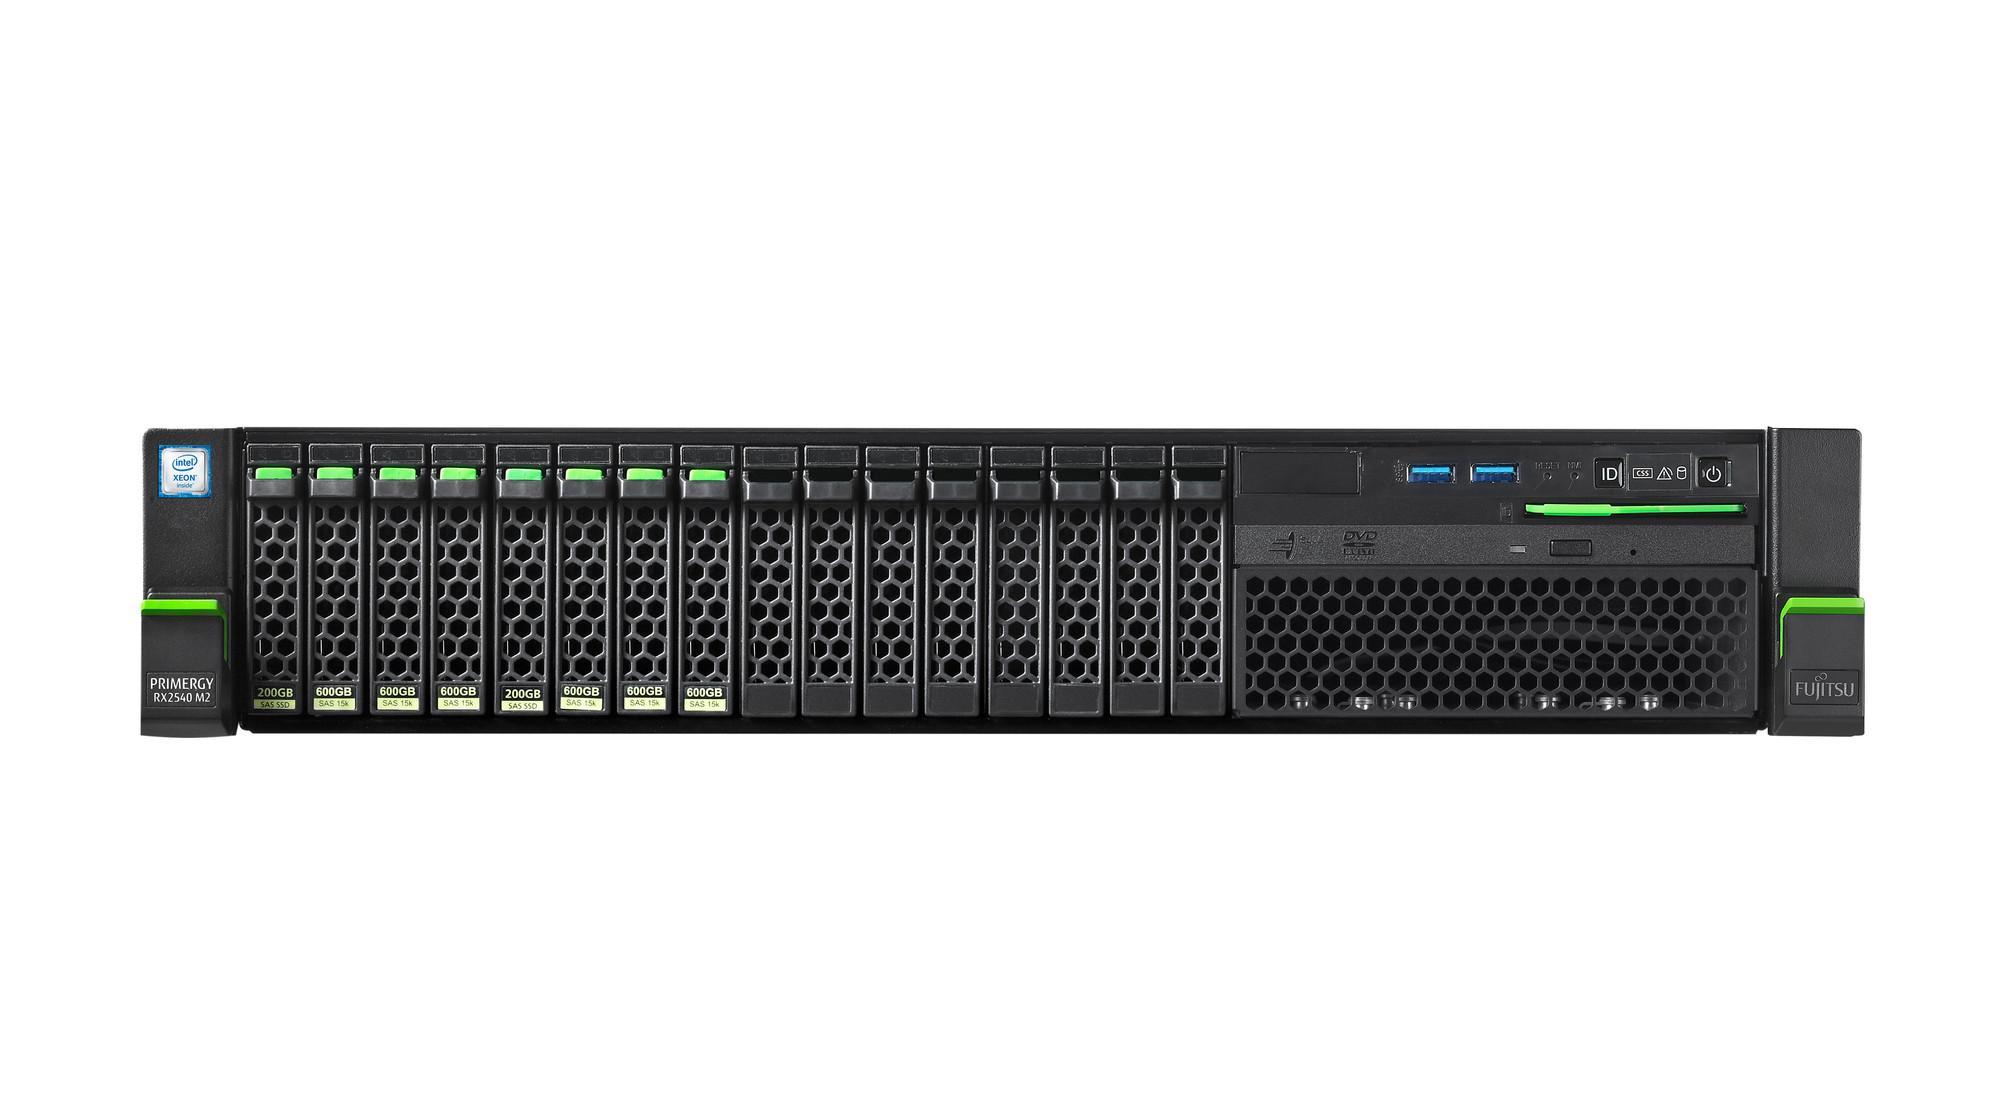 "Сървър Fujitsu Primergy RX2540M2 SFF Intel Xeon E5-2620v4/16GB/CF4 8X2.5""EXP/RAID12G 2GB/LAN4X1GB/PSU 800W"